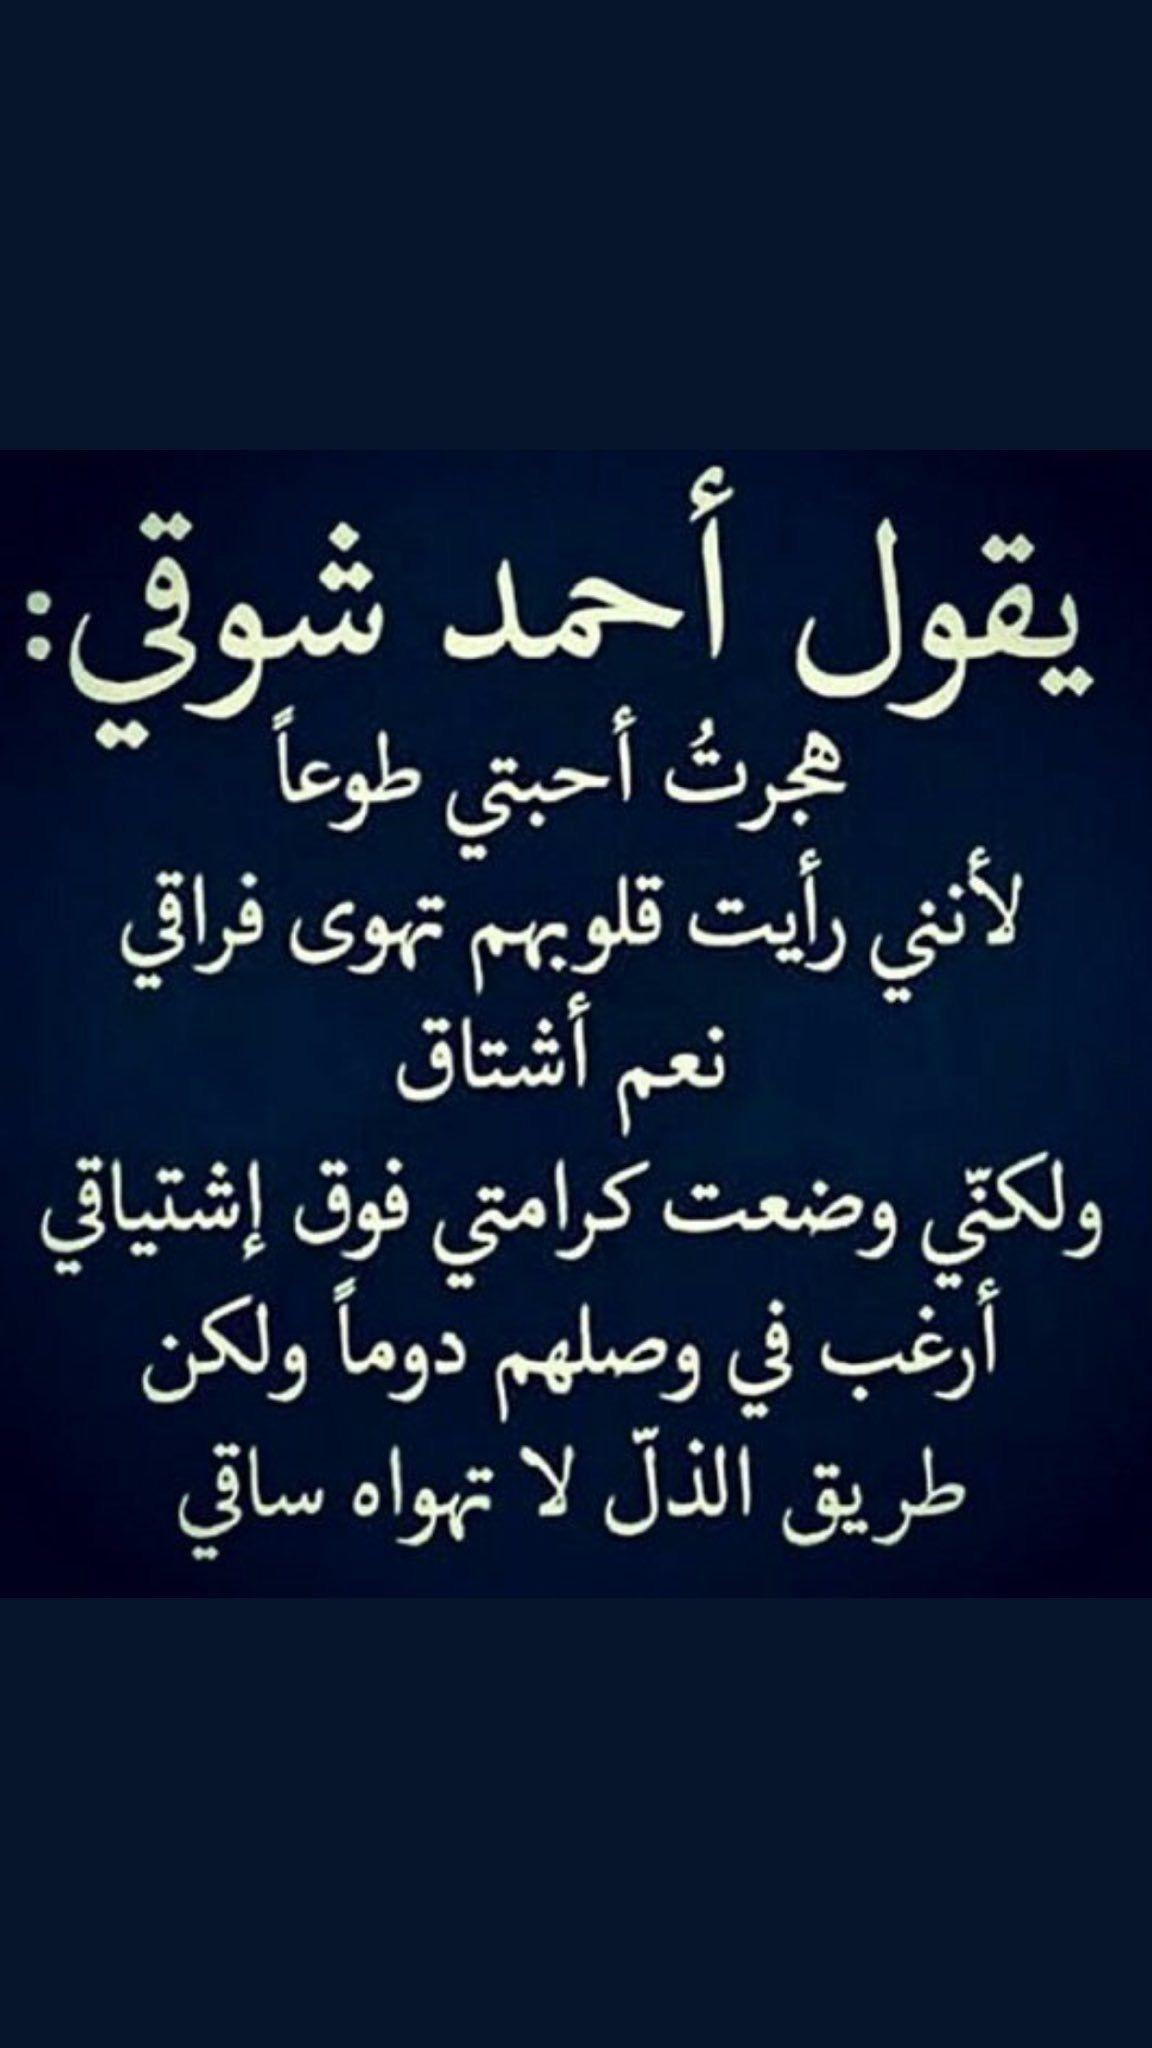 أحمد بك شوقي Arabic Calligraphy Calligraphy Arabic